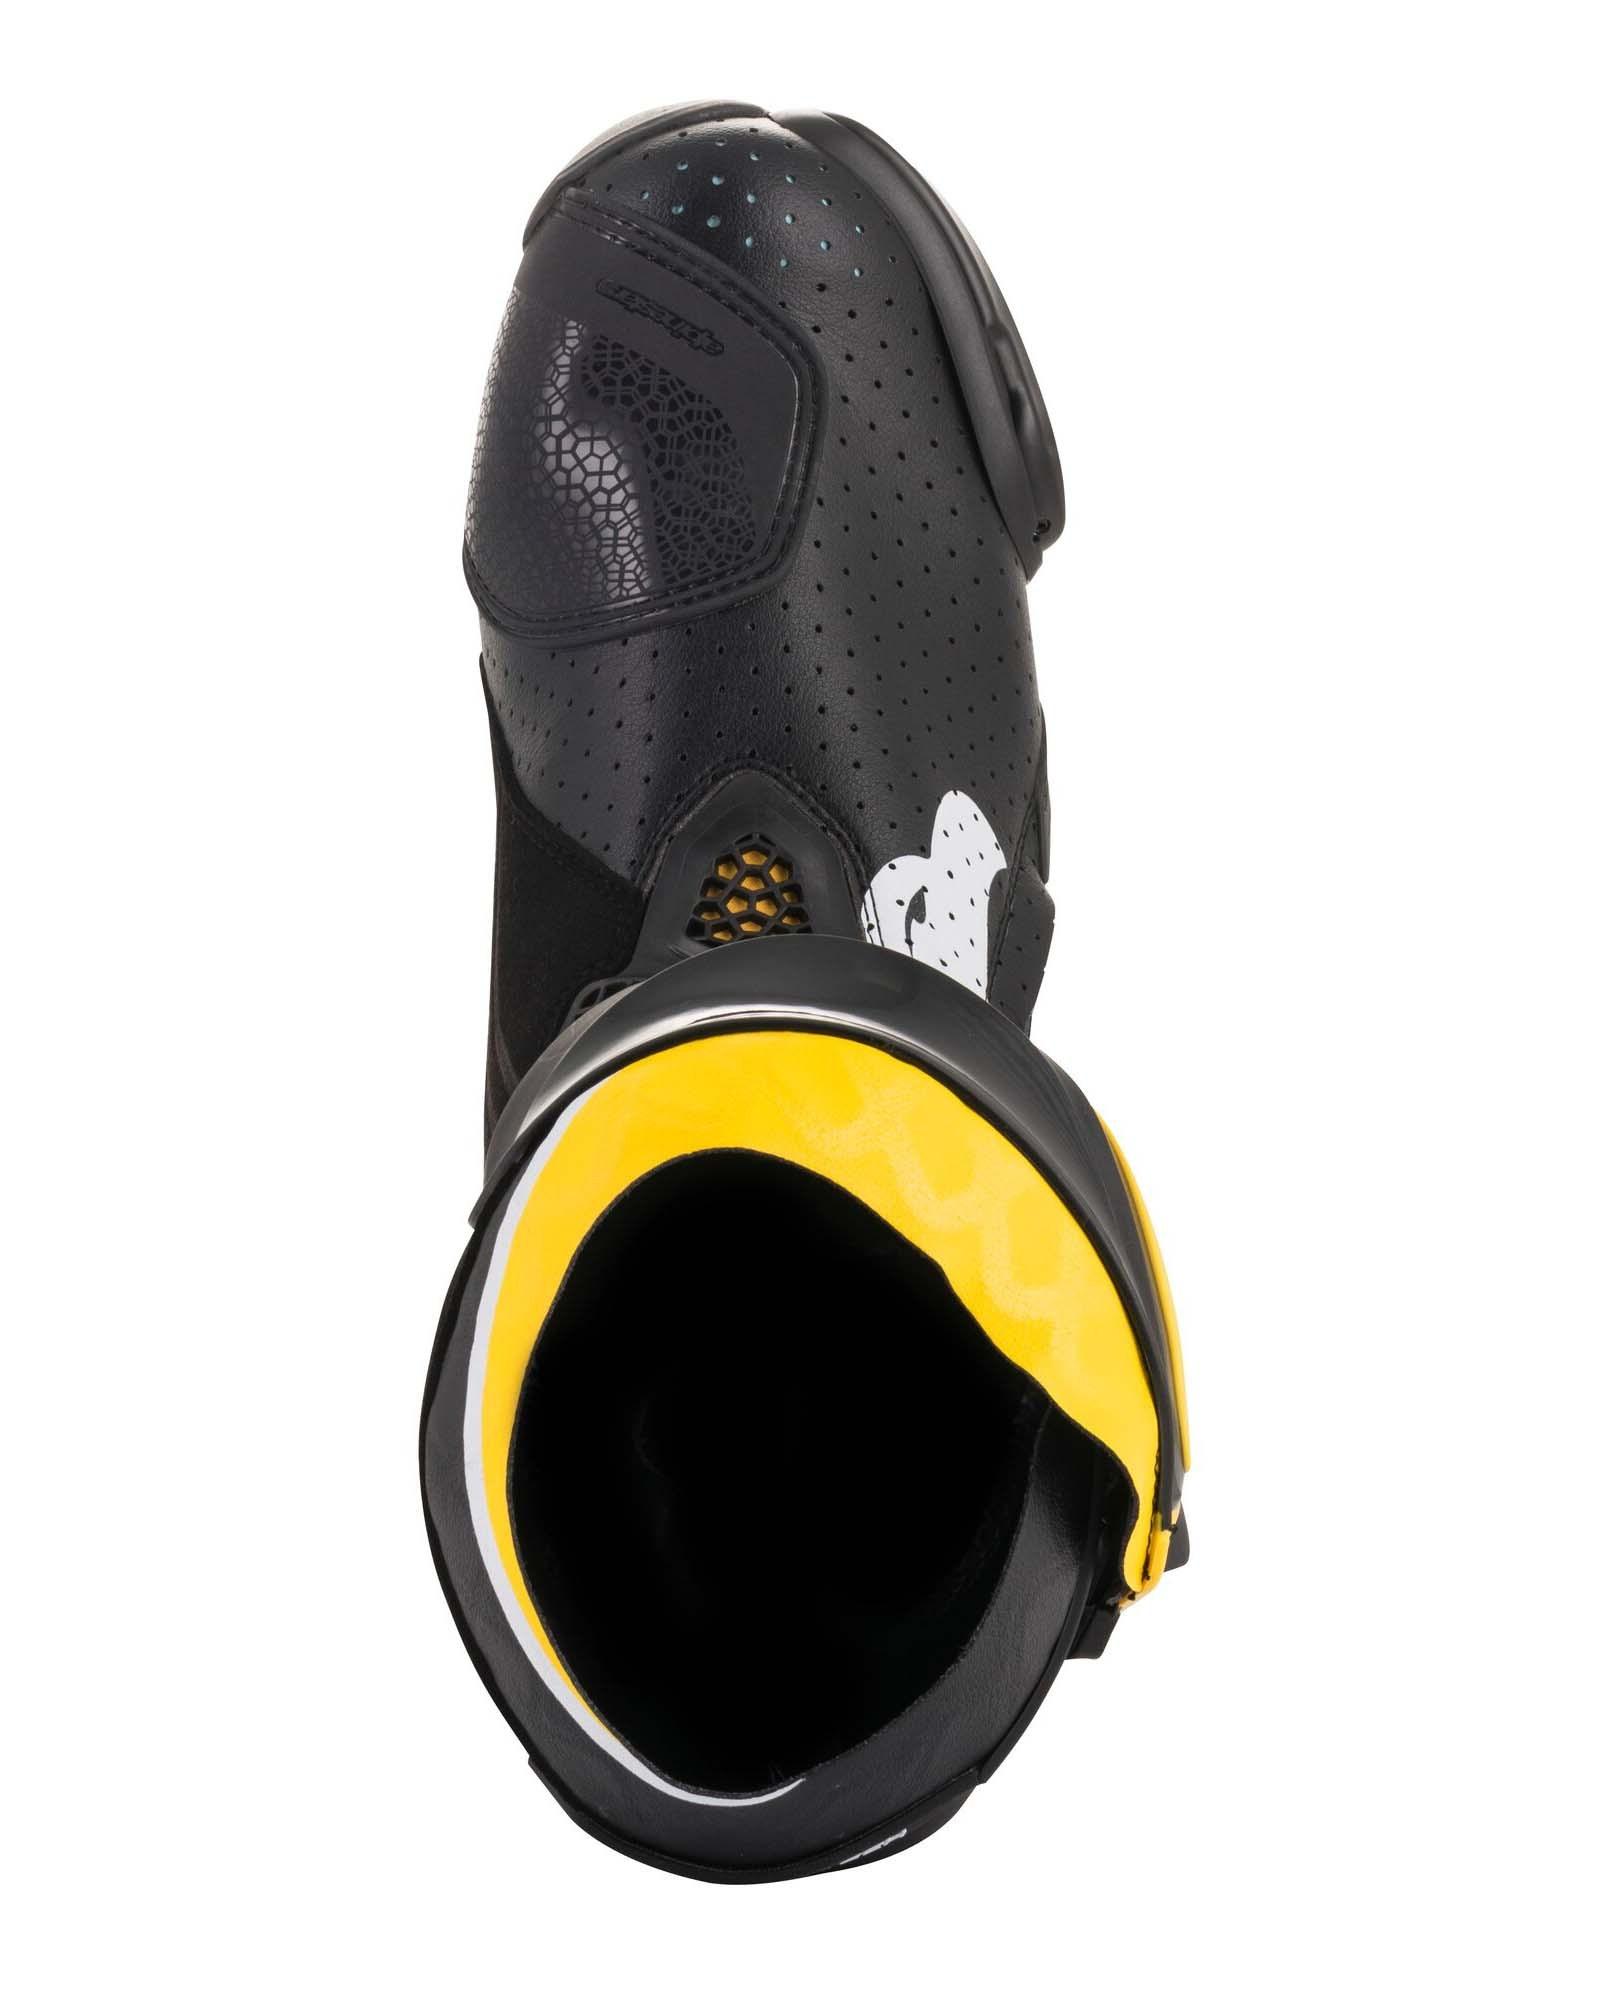 Alpinestars-Supertech-R-Boots-Kenny-Roberts-Sr-06